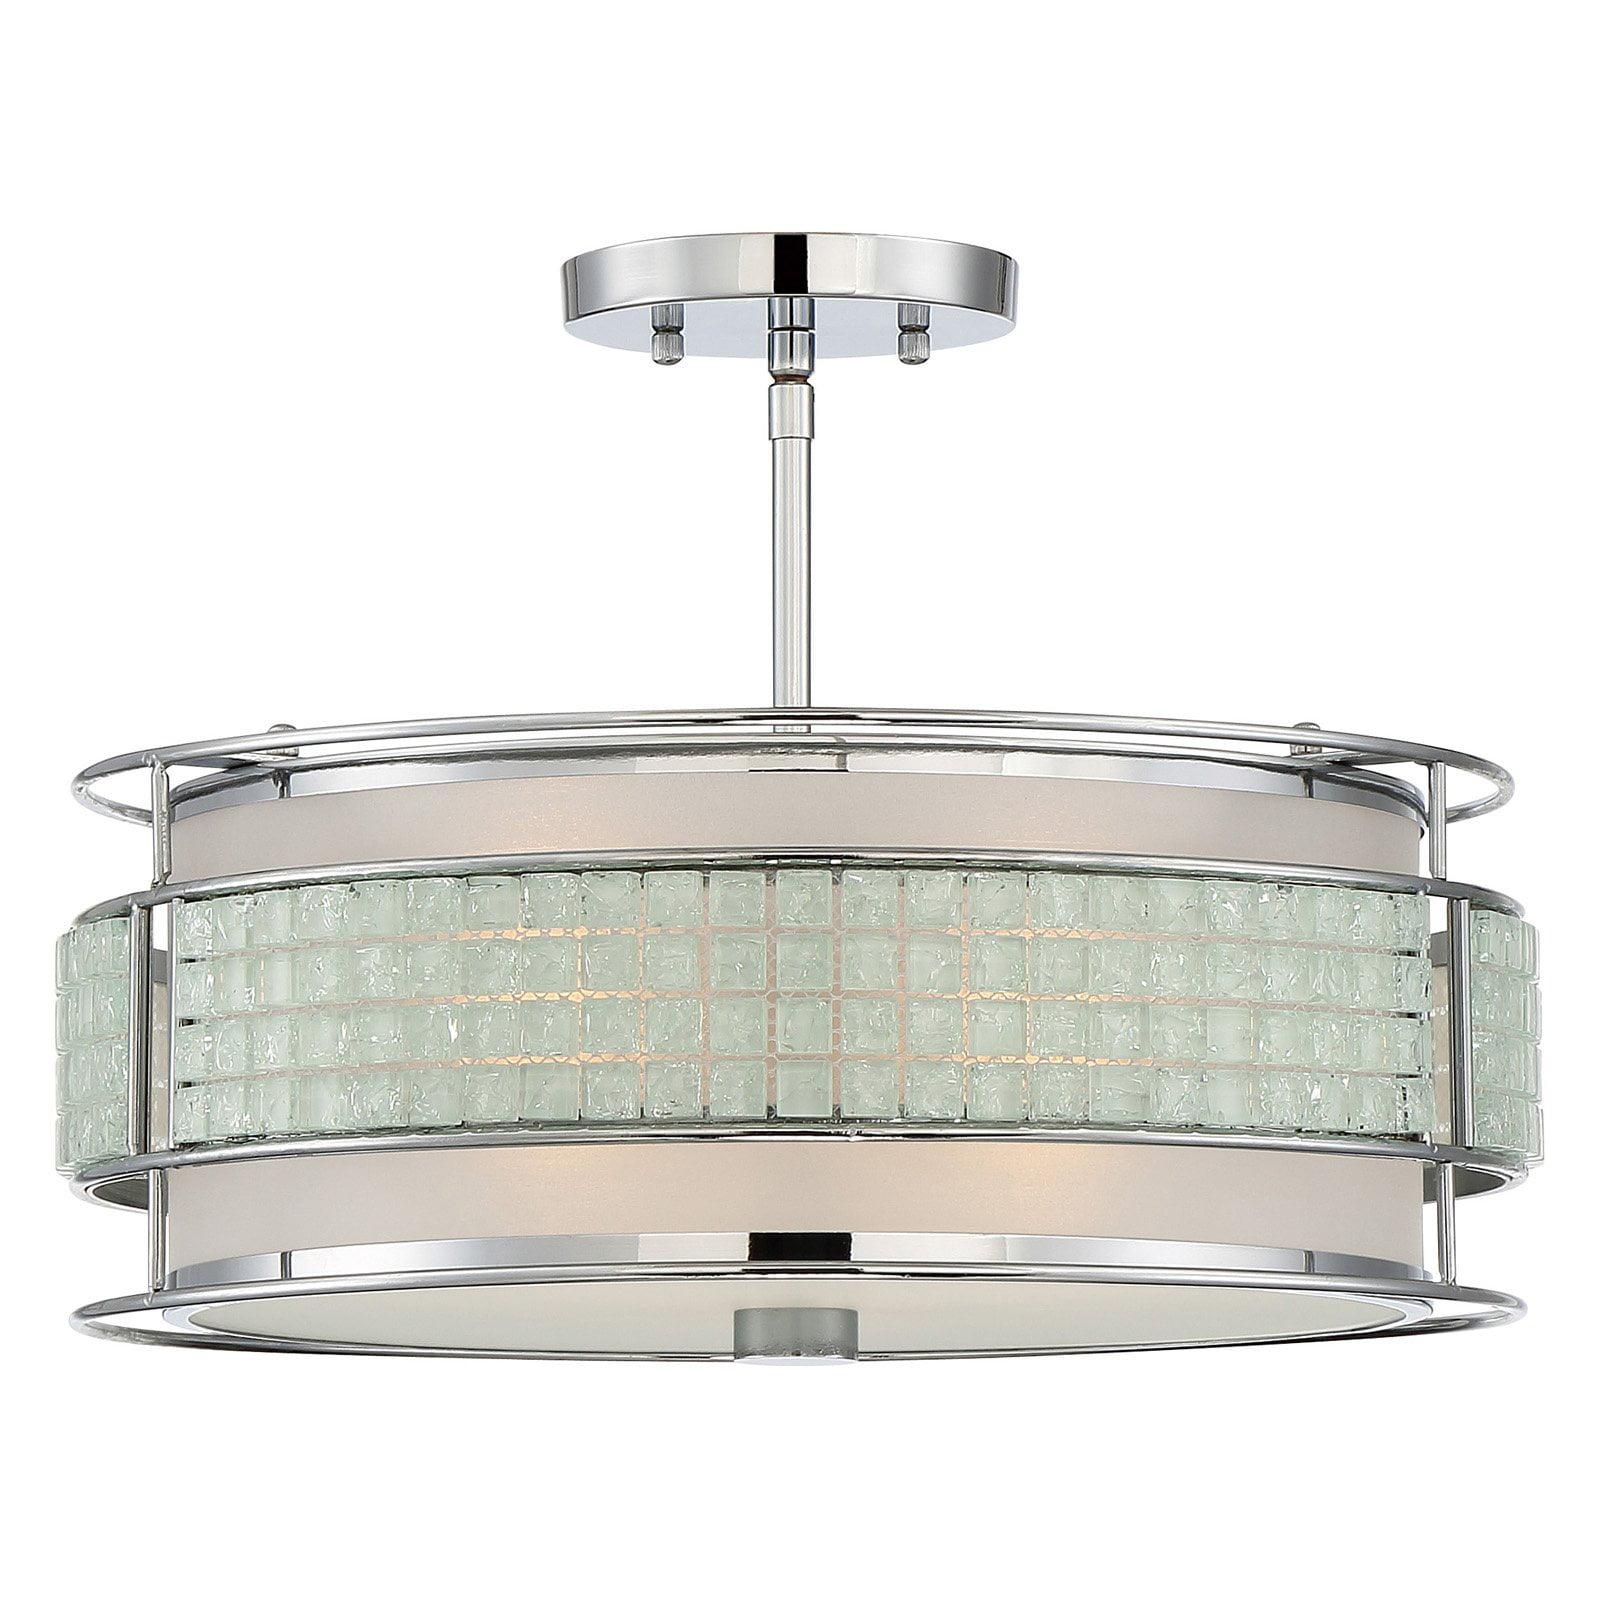 Quoizel Boundary BNY1716C Semi Flush Mount Light by Quoizel